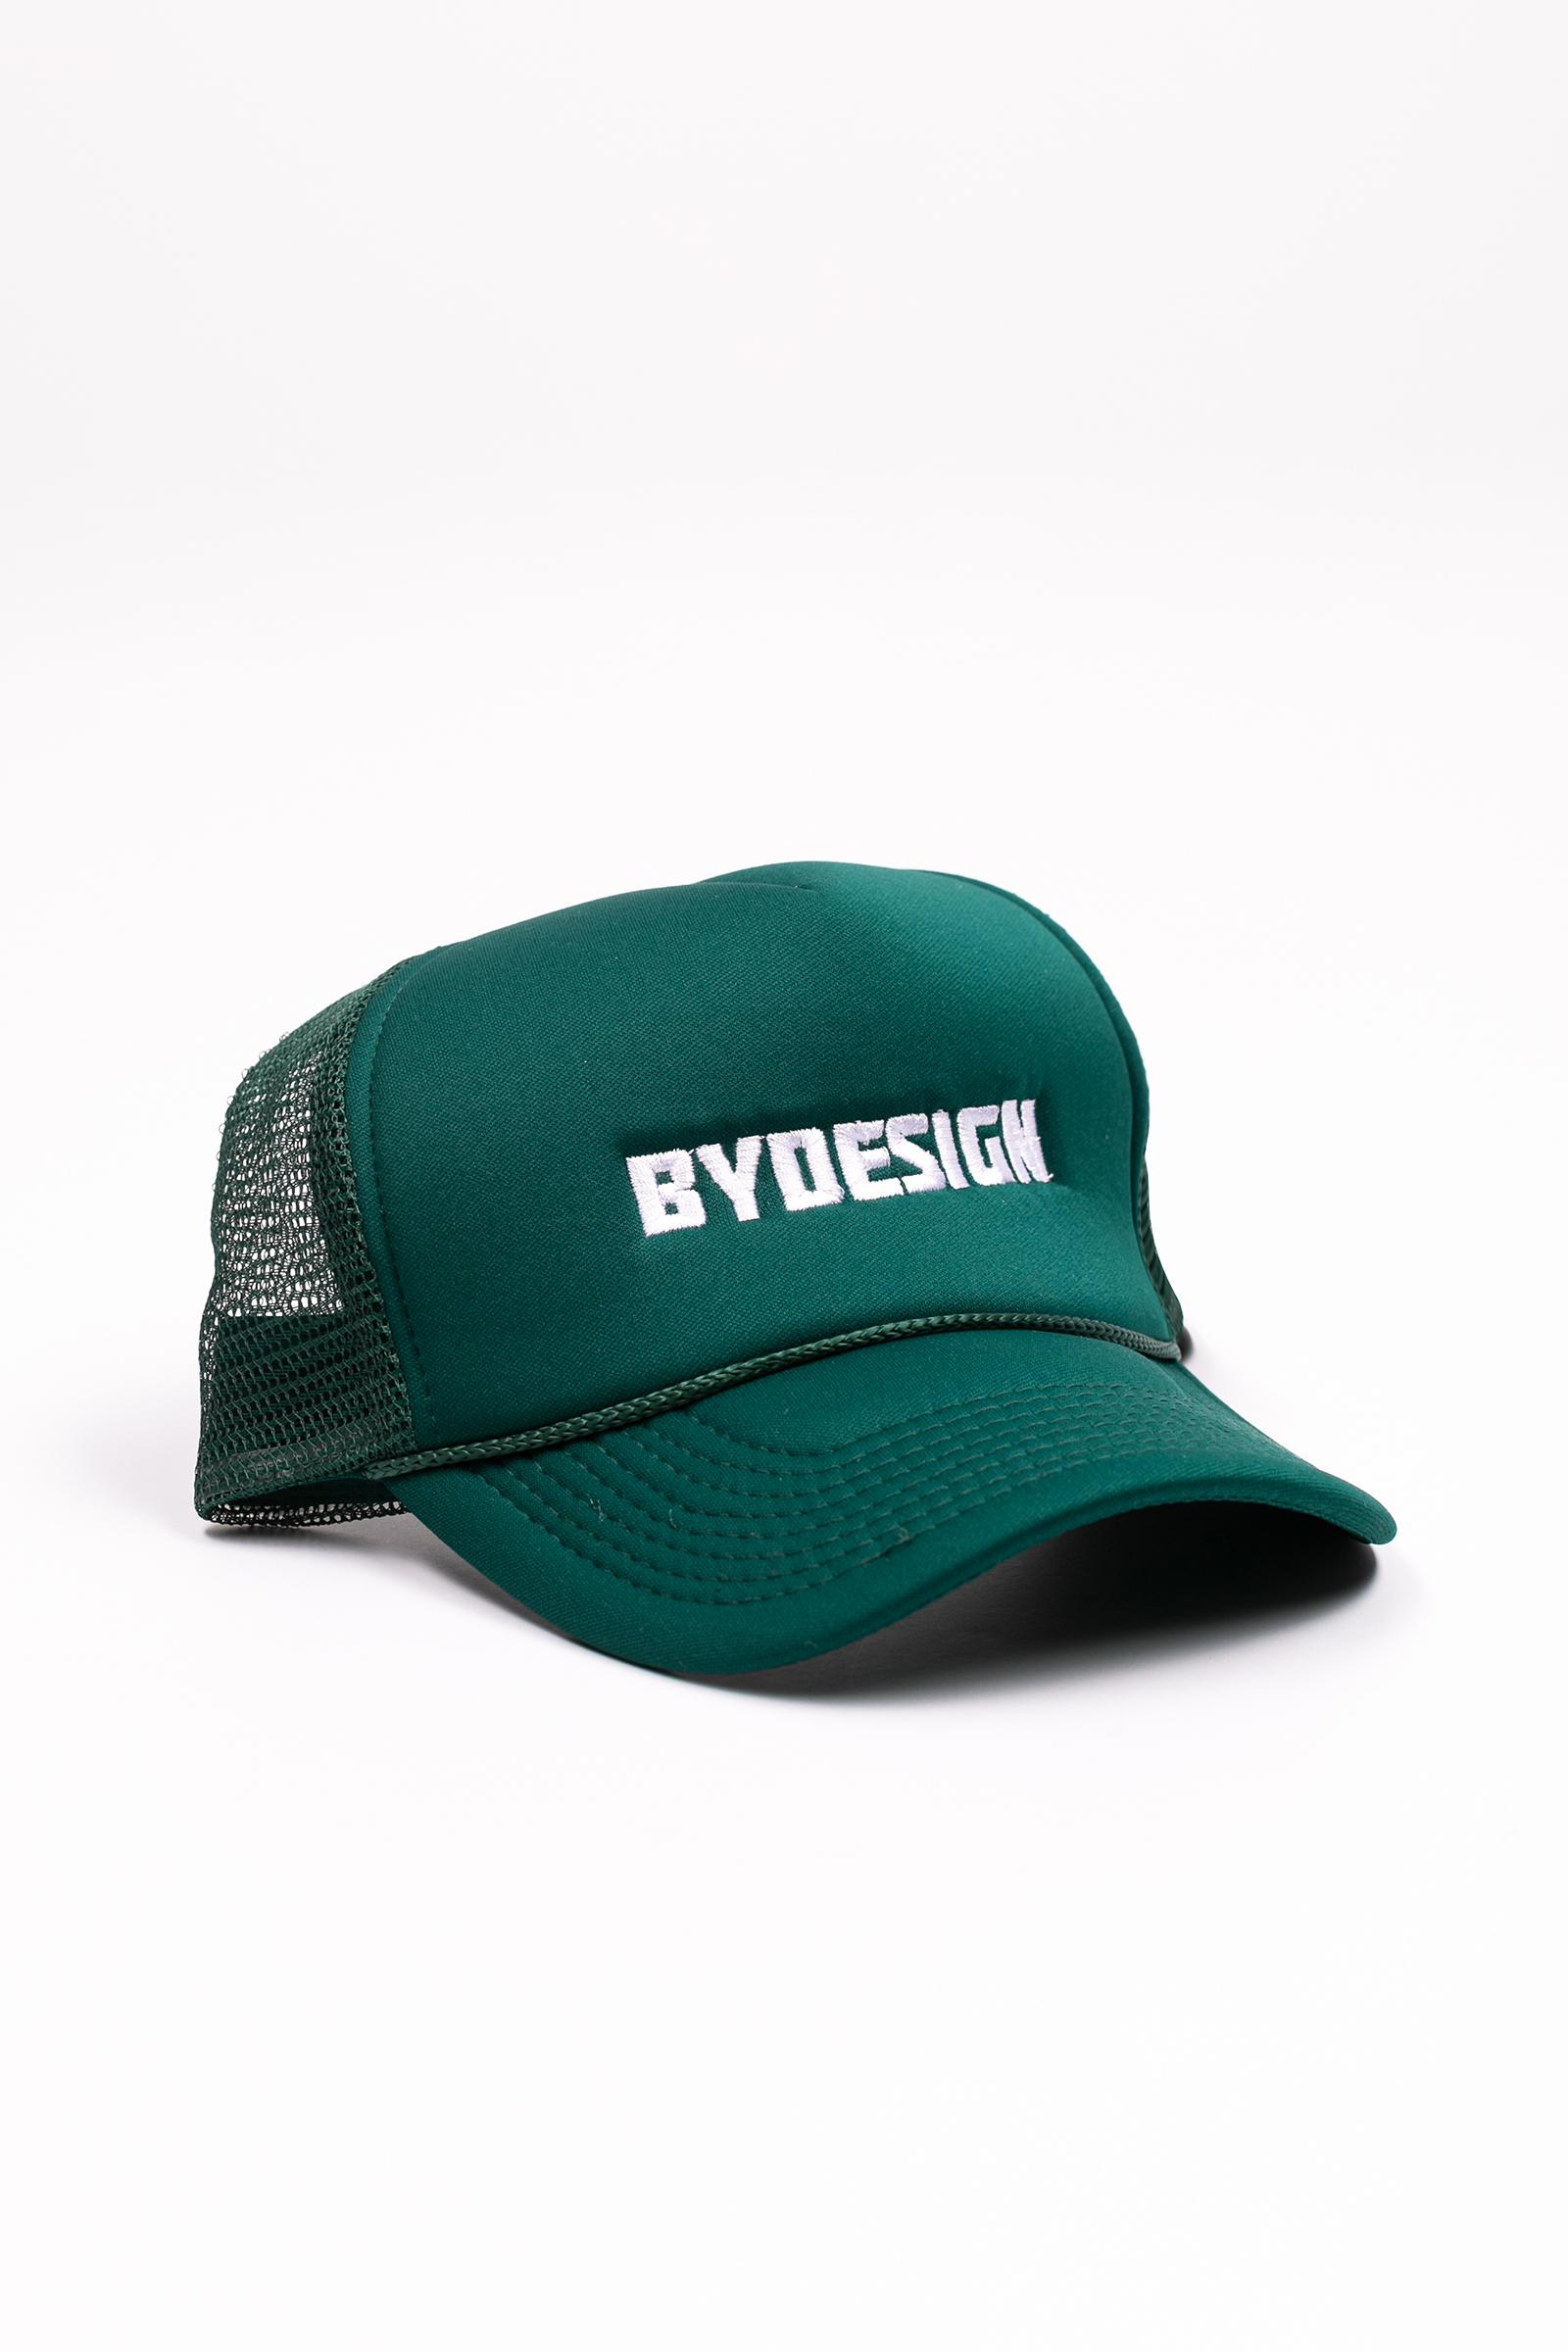 By Design Logo Trucker Hat - Green